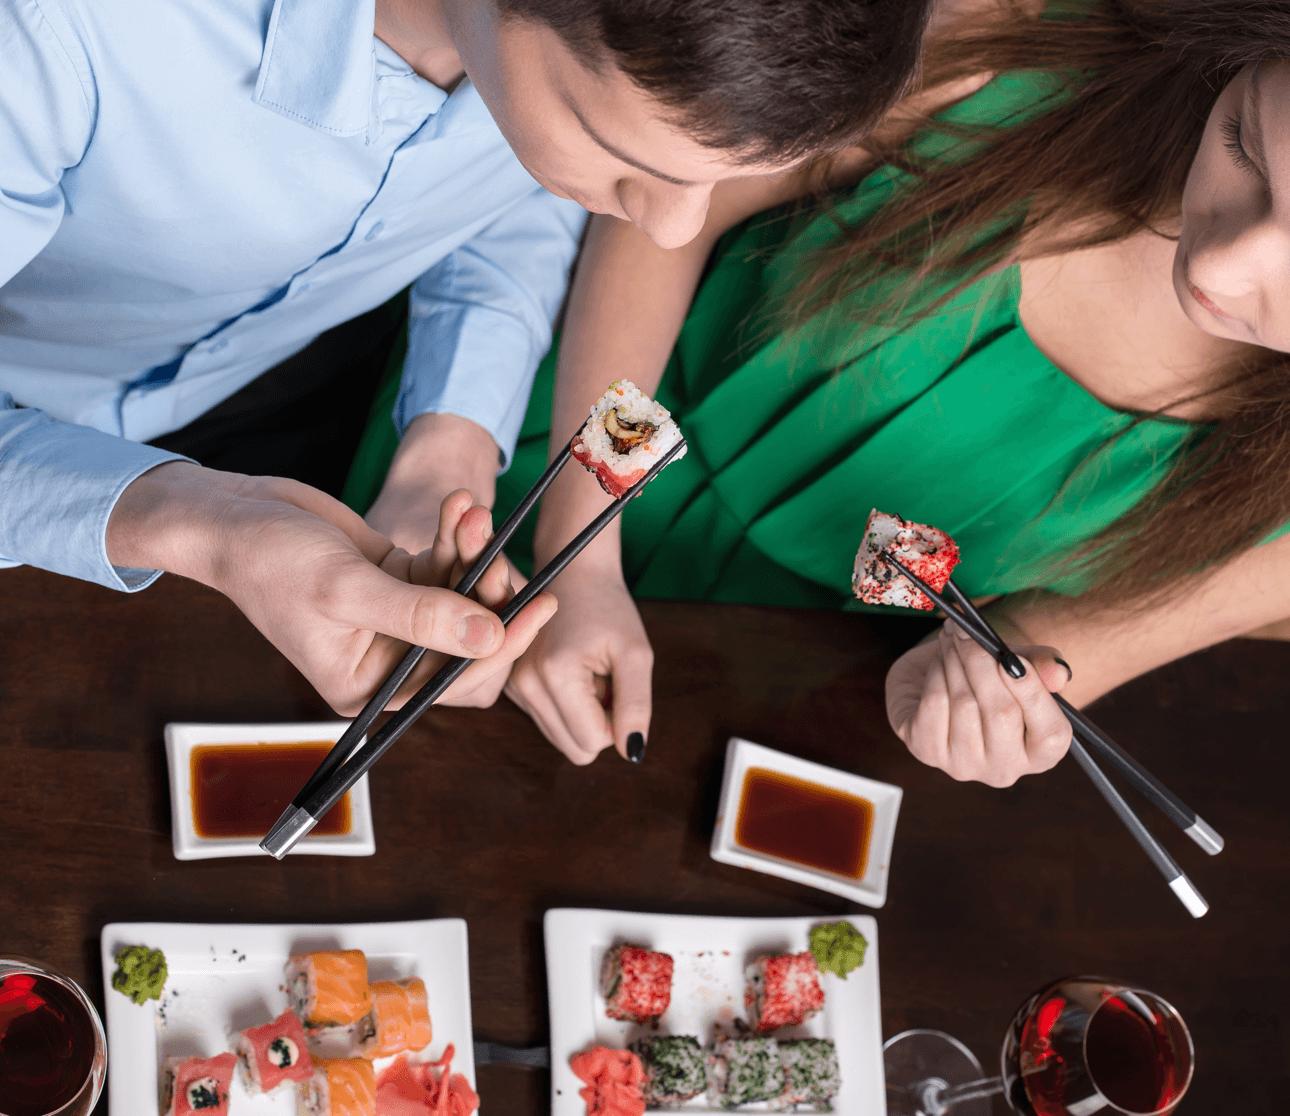 calgarys-best-spots-valentines-day-dinner-sushi-image